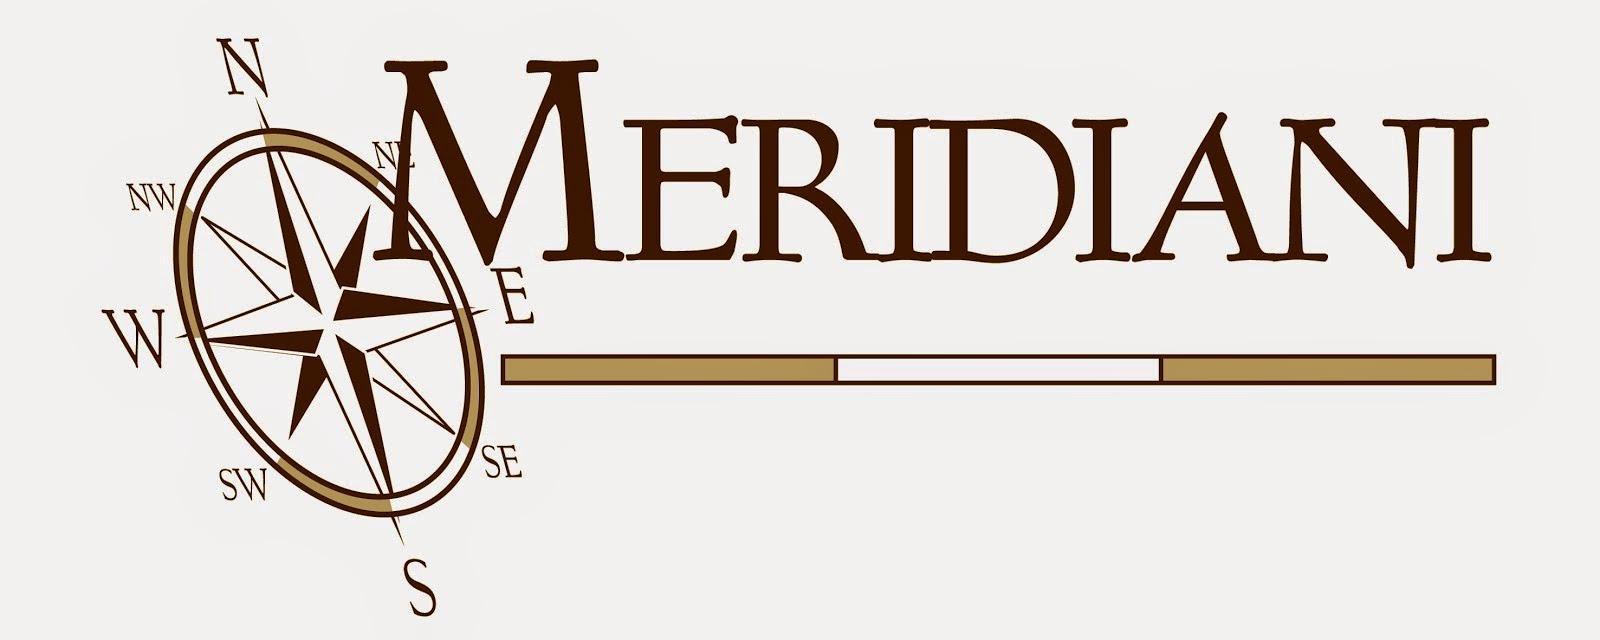 tè meridiani